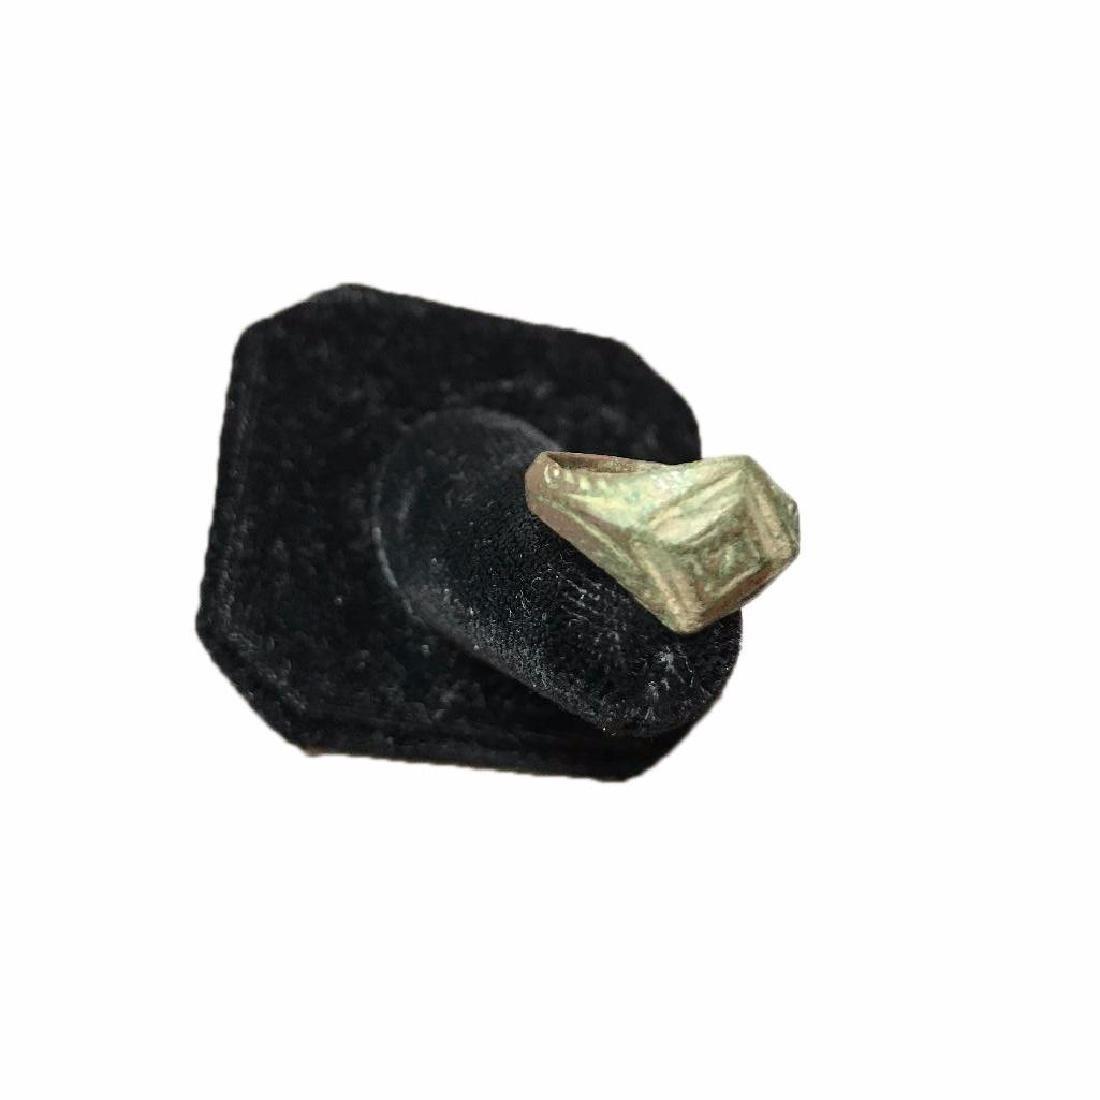 300-400 AD Ancient Roman Bronze Ring - 3